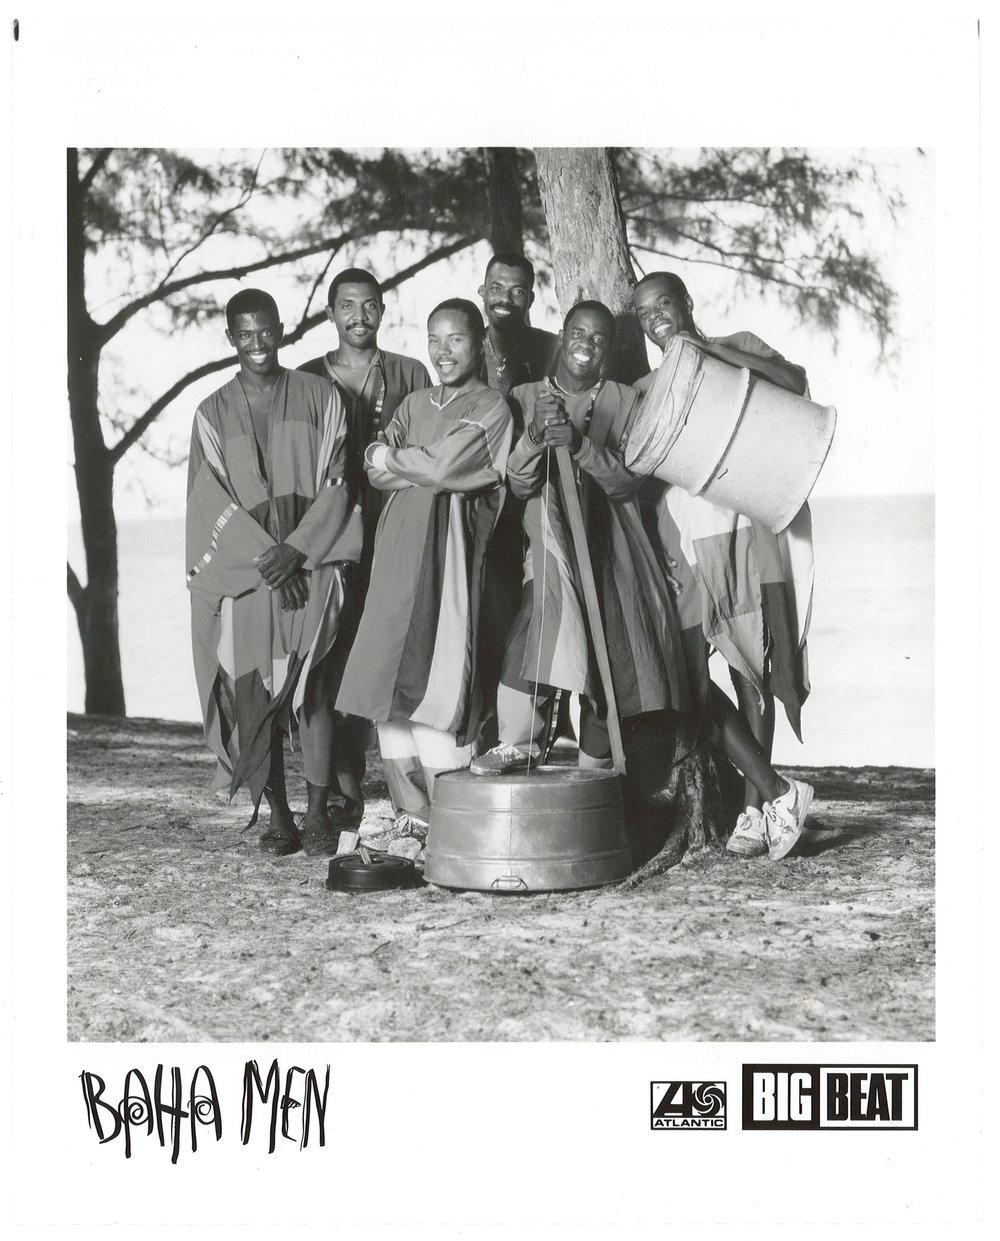 WLWLTDOO-1992-EPHEMERA-BAHA_MEN-MEDIA_KIT-PHOTO.jpg